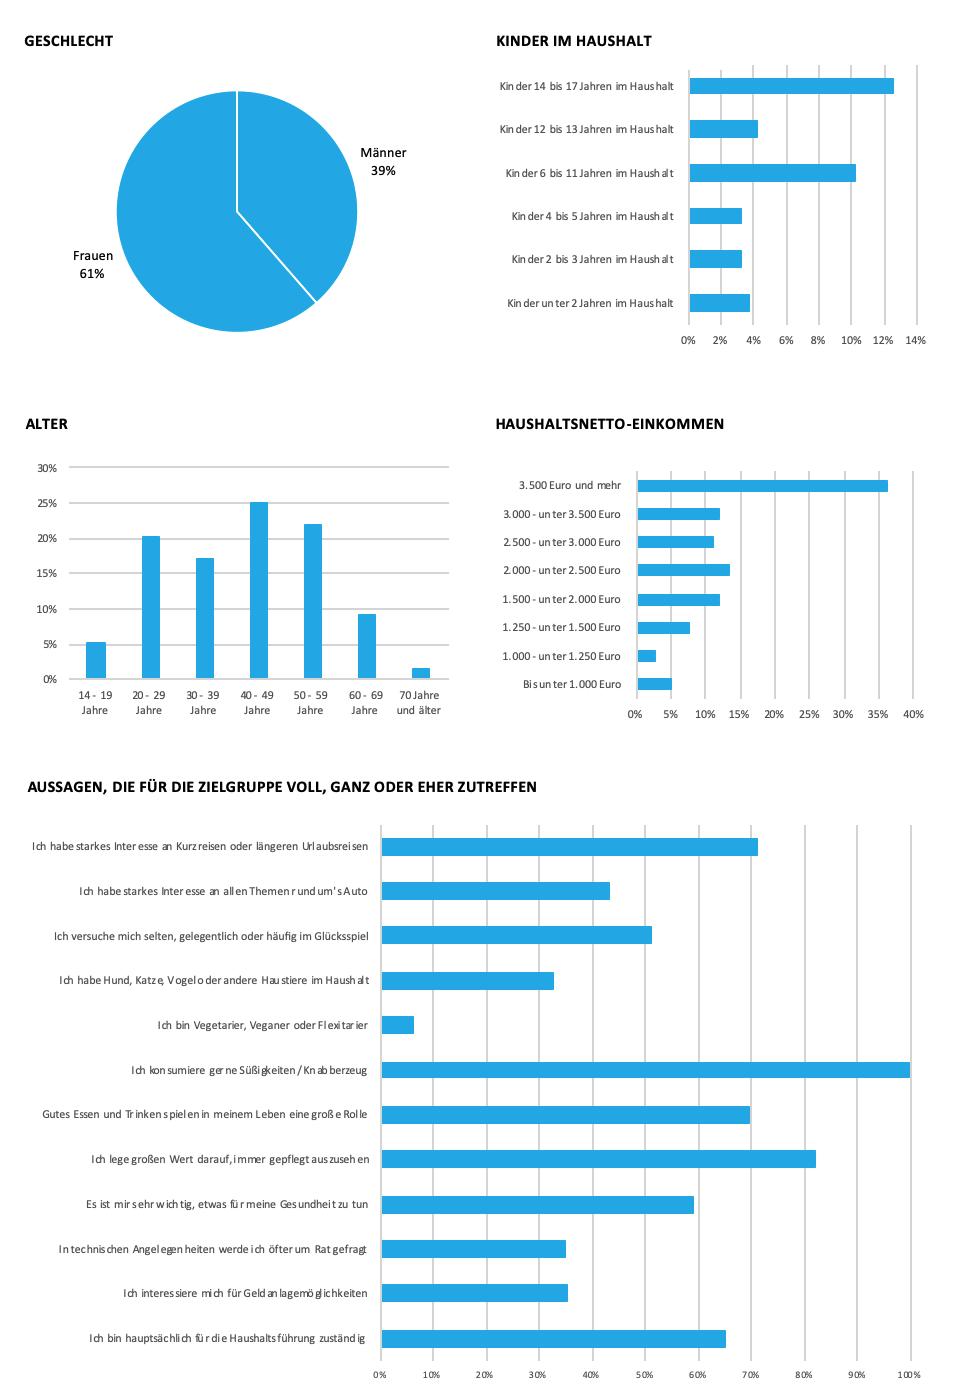 Grafik z usoziodemografischen Daten HelloFresh